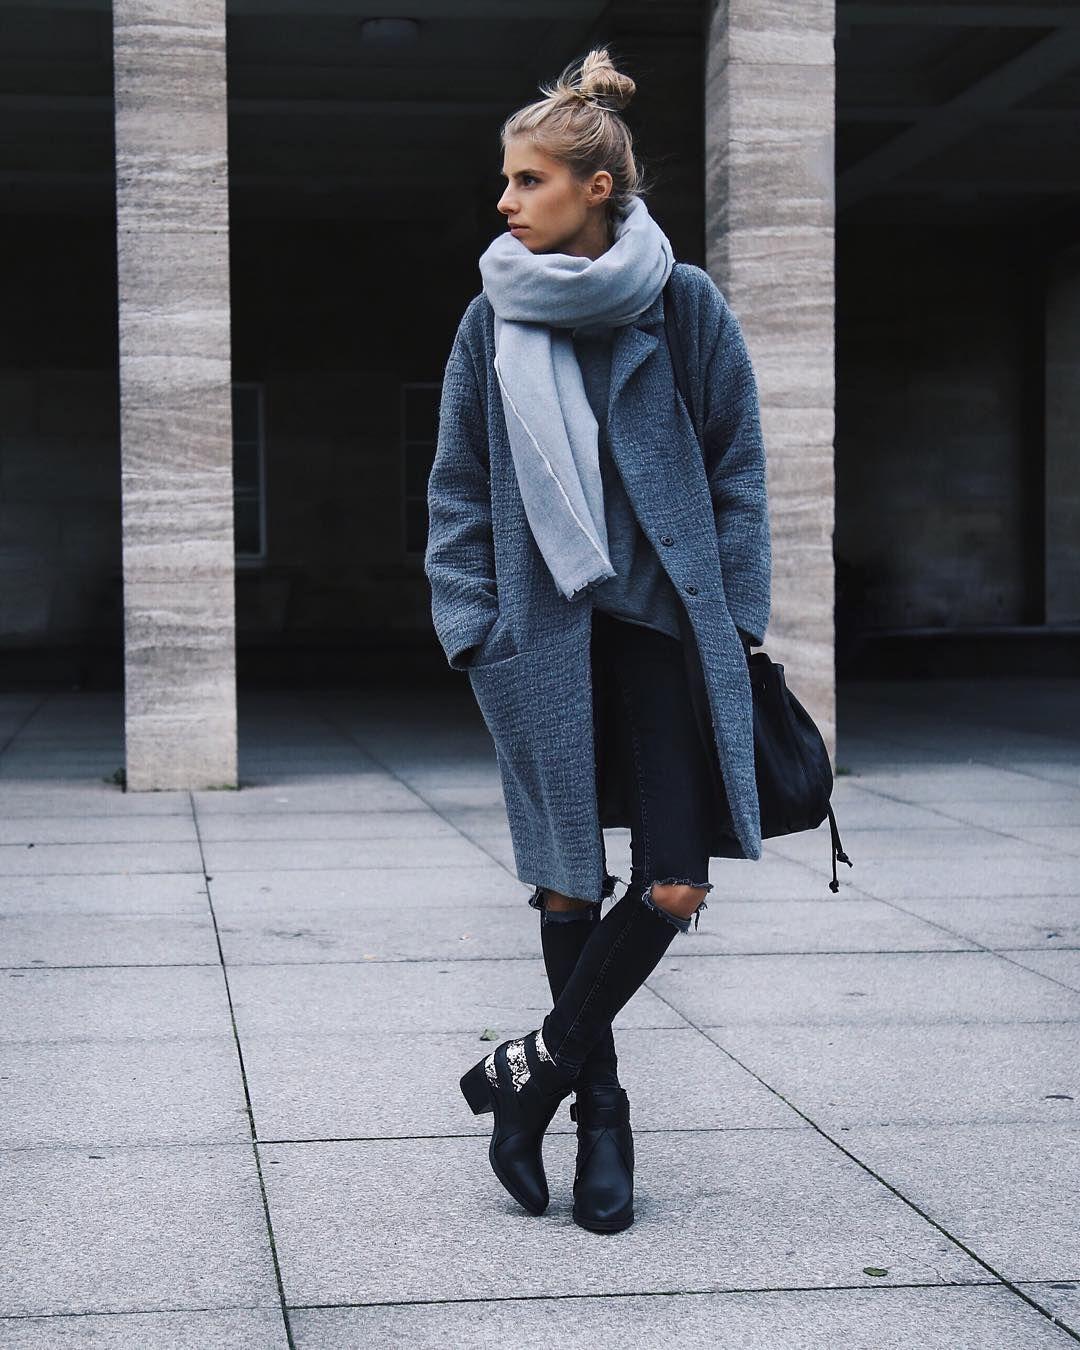 www.fashionclue.net| Fashion Tumblr, Street Wear ...